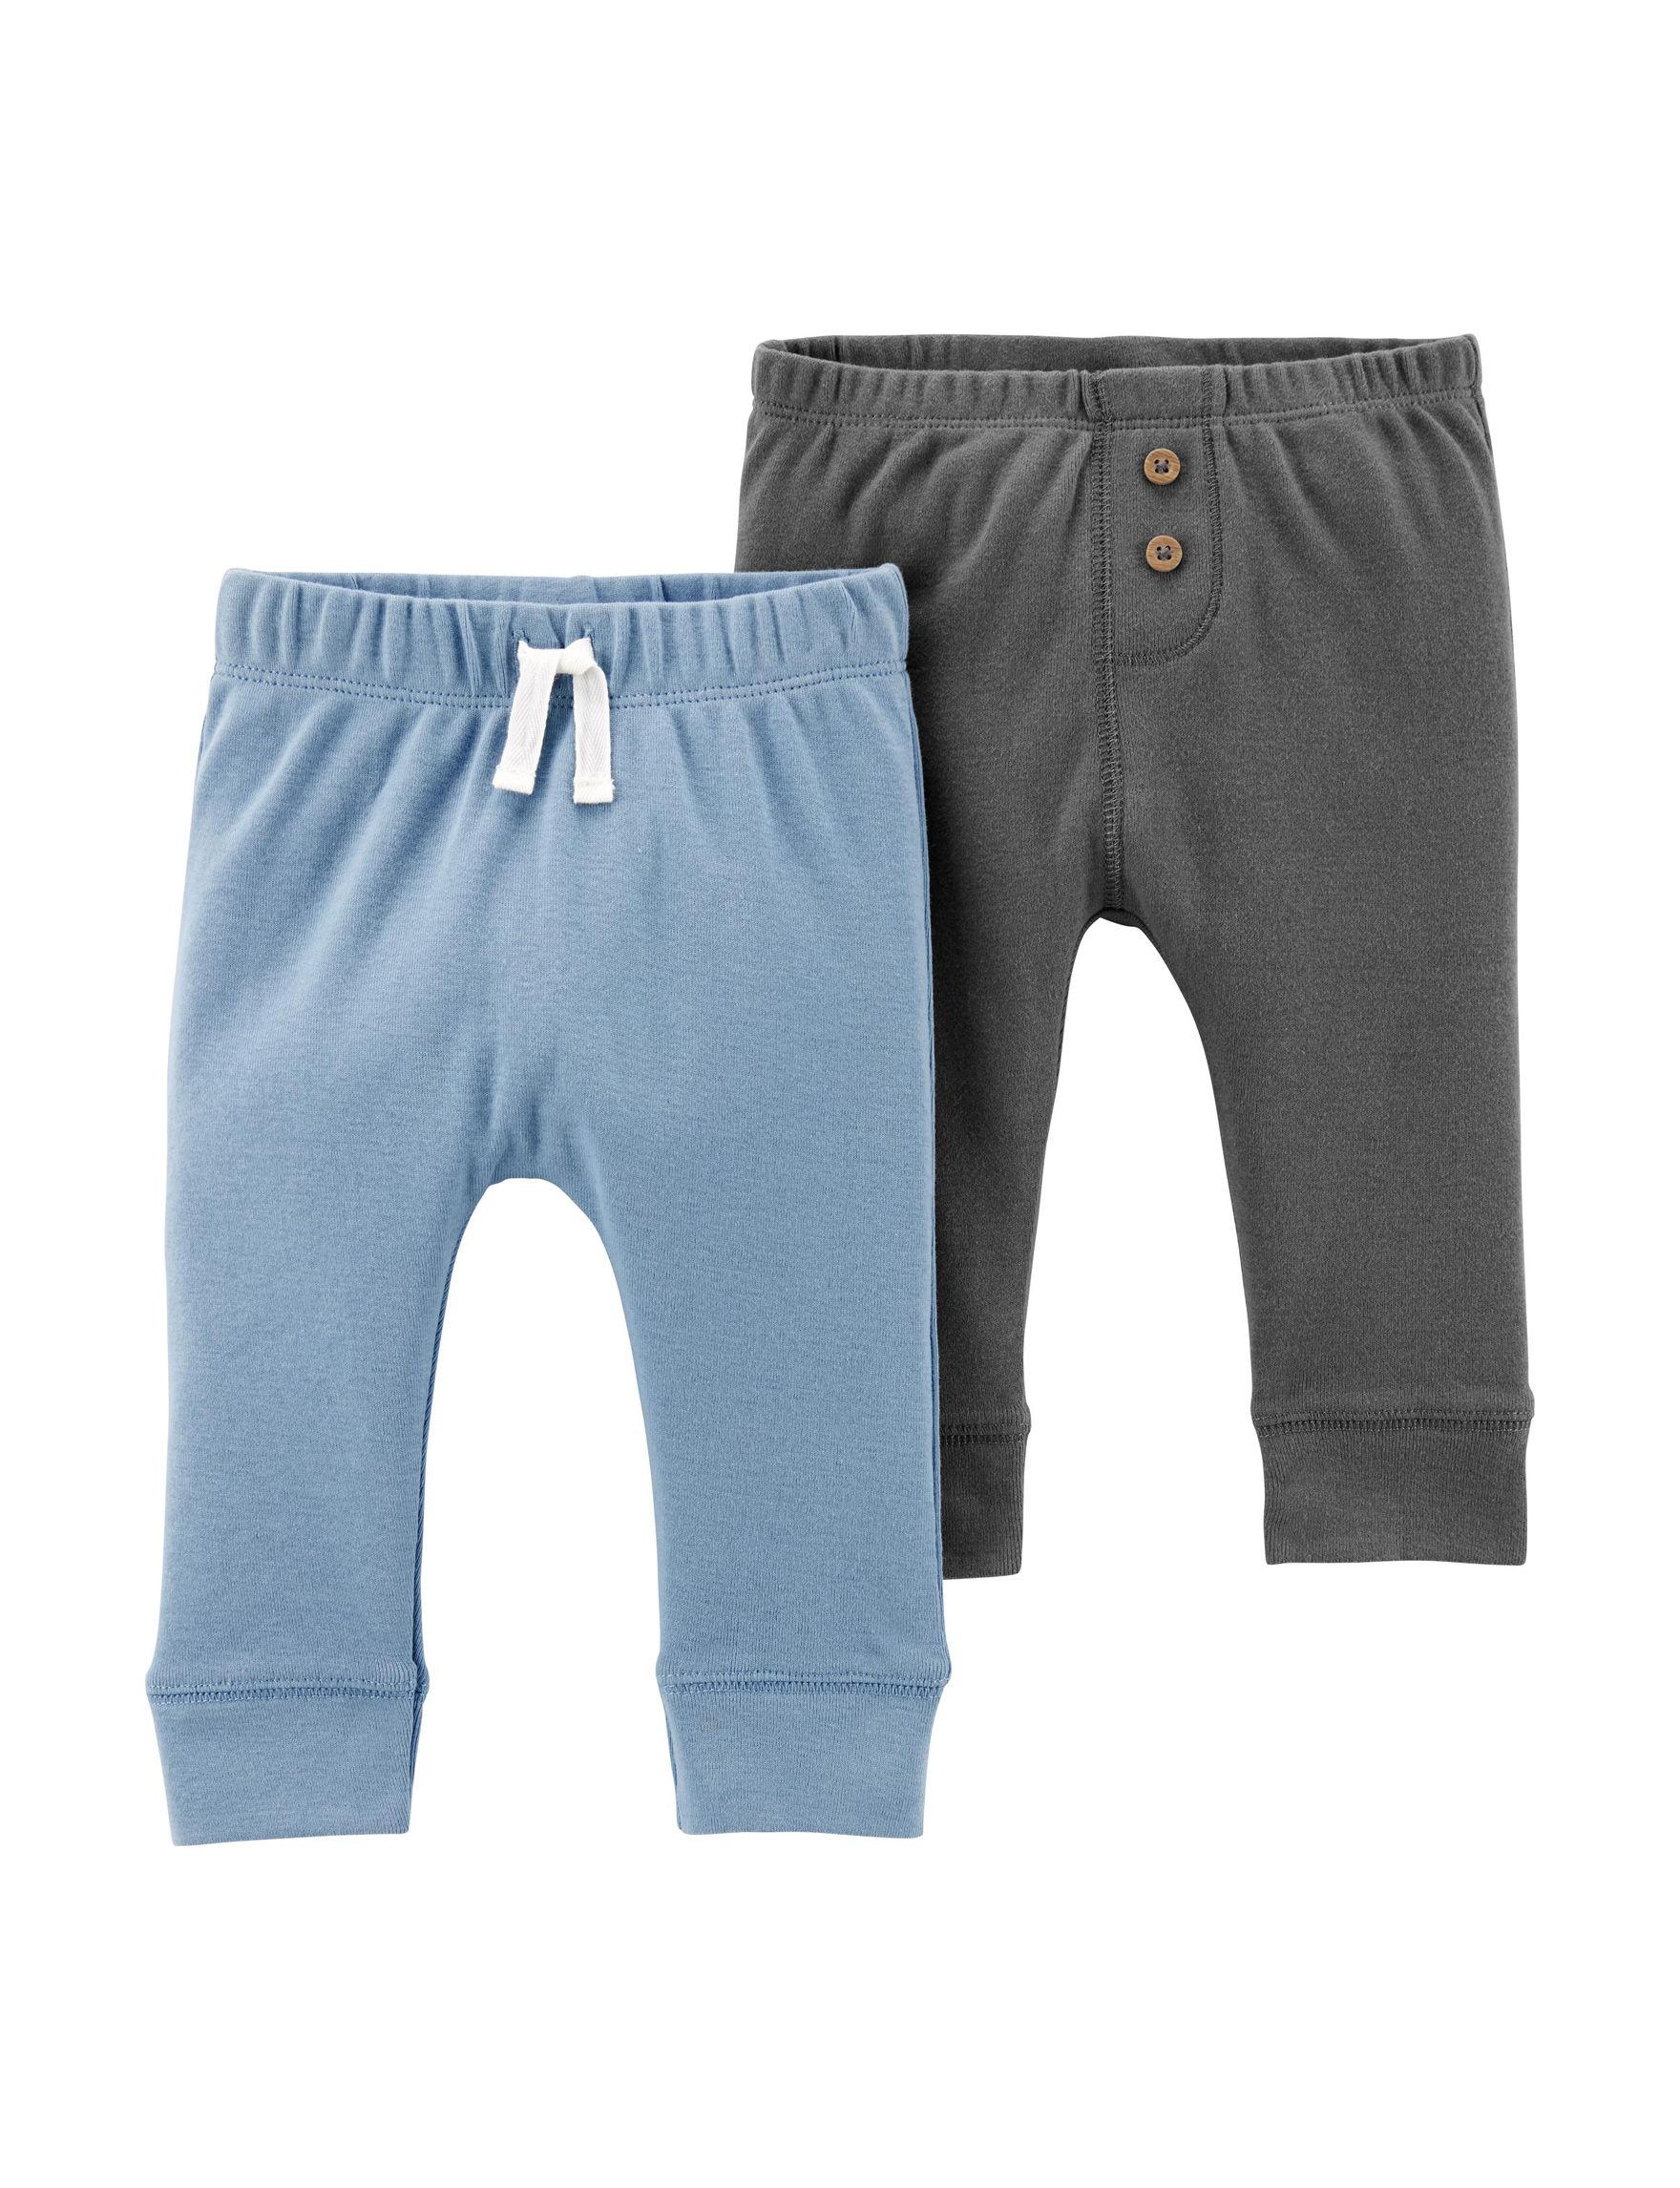 Carter's Blue / Grey